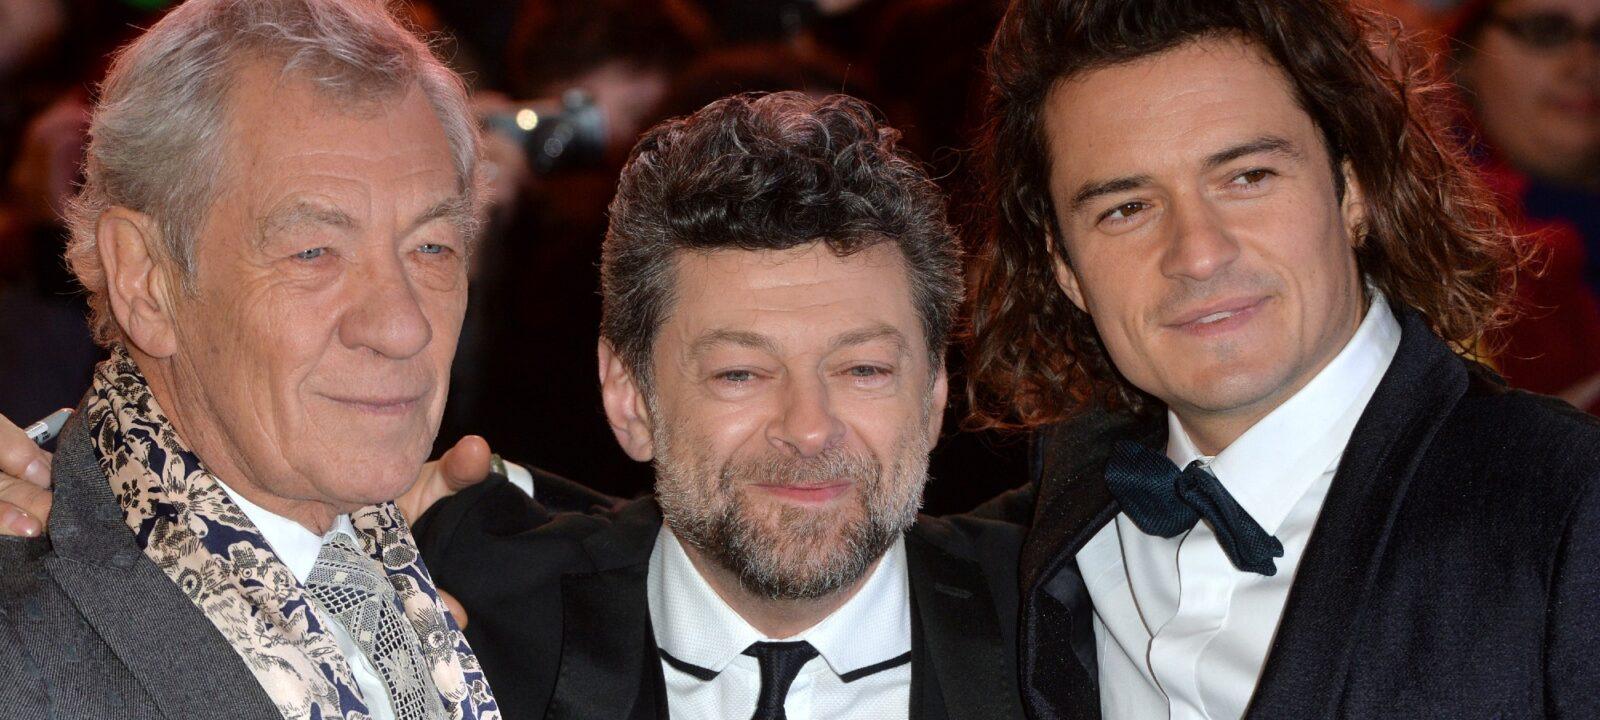 Sir Ian McKellen Andy Serkis Orlando Bloom